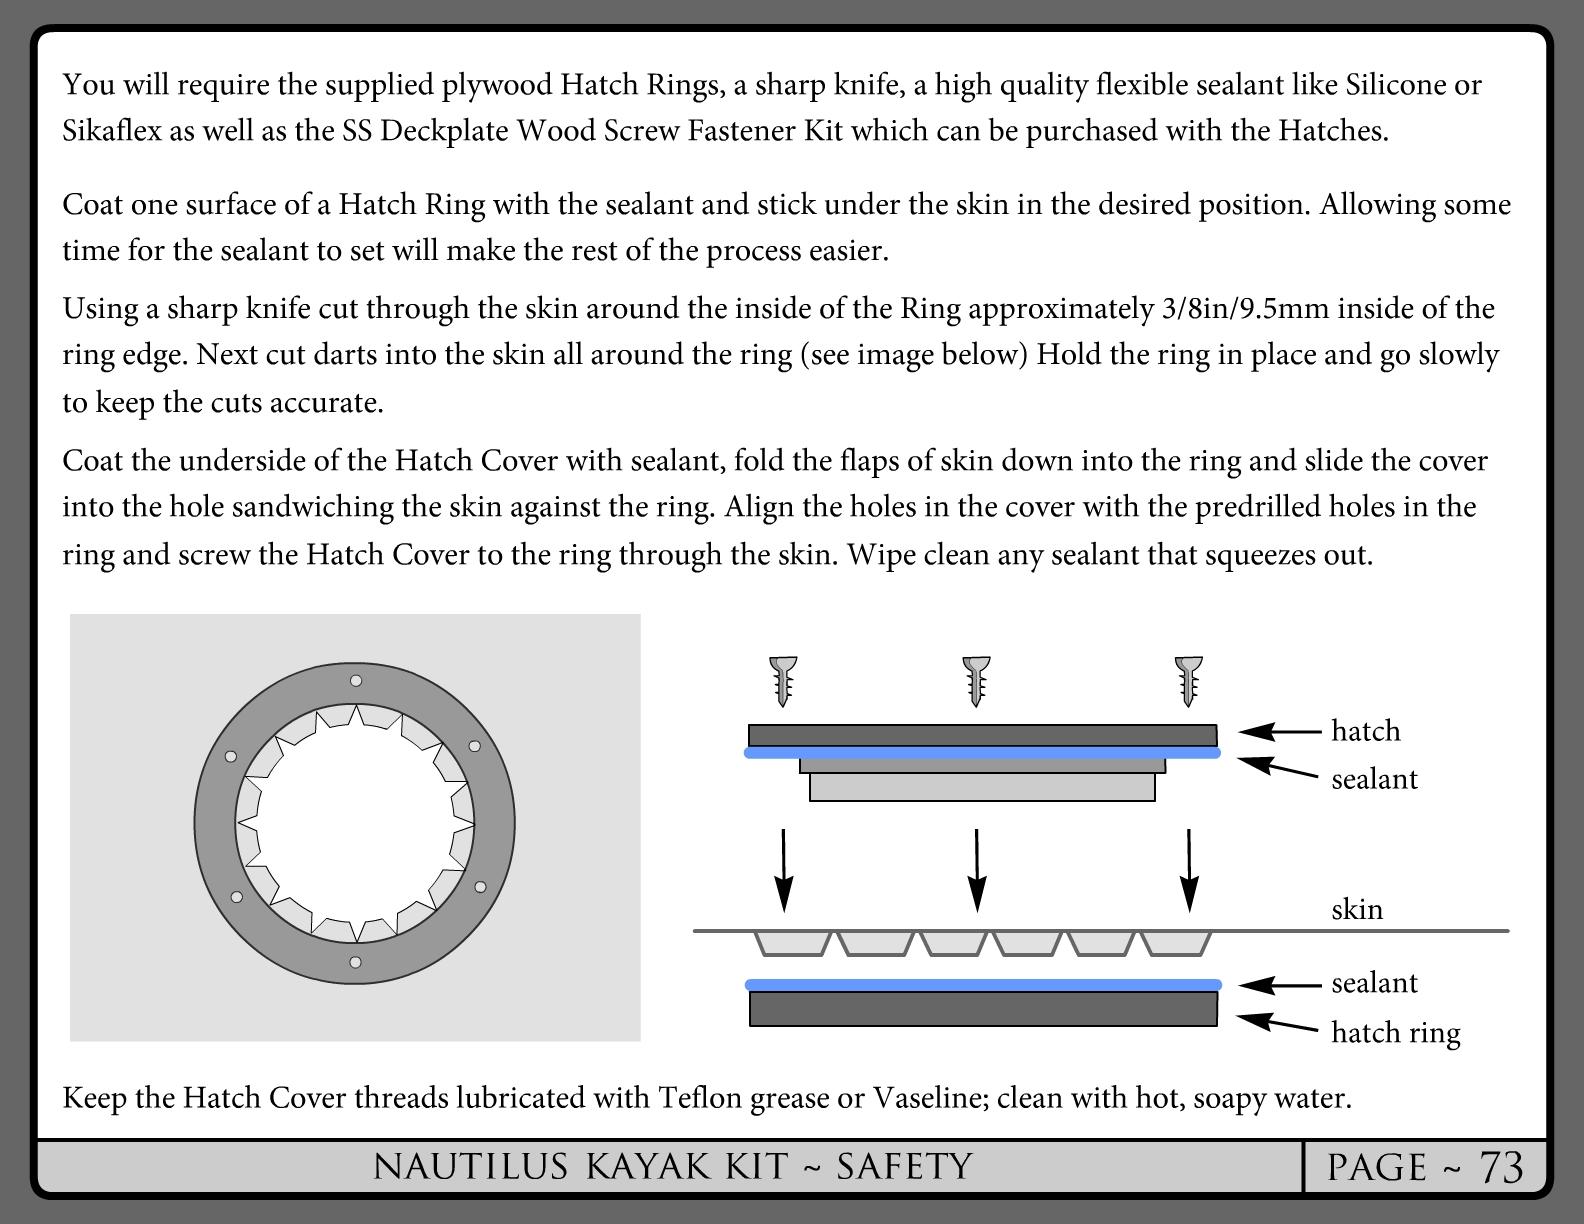 Nautilus Instructions_0076.jpg